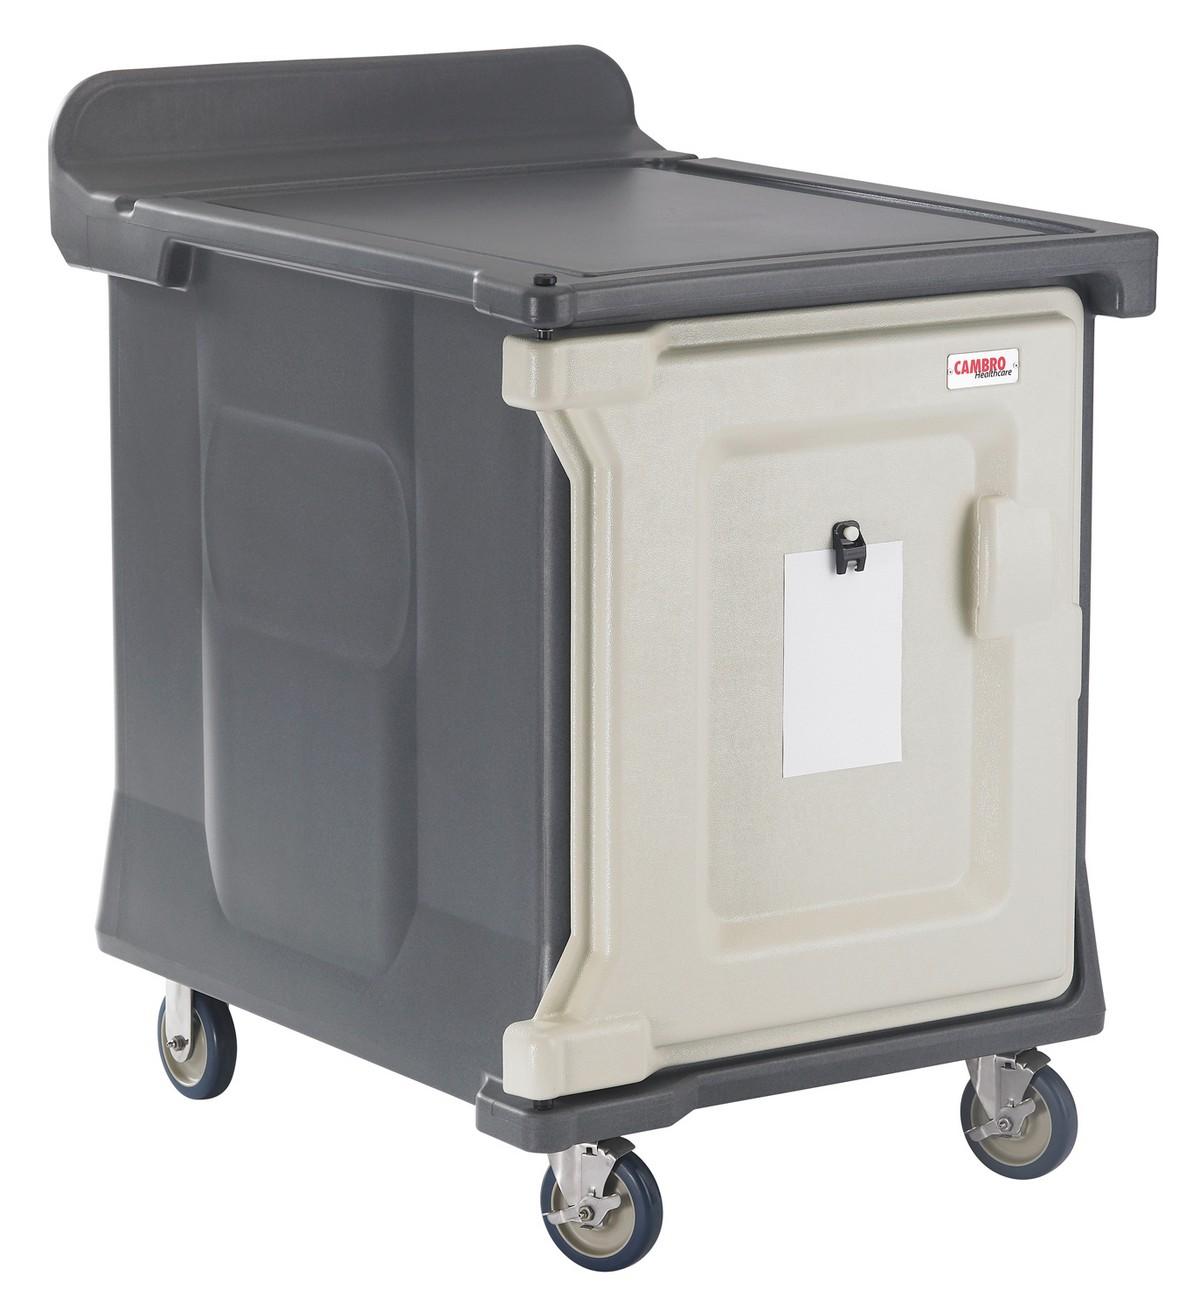 Cambro Room Service Cart MDC1520S10